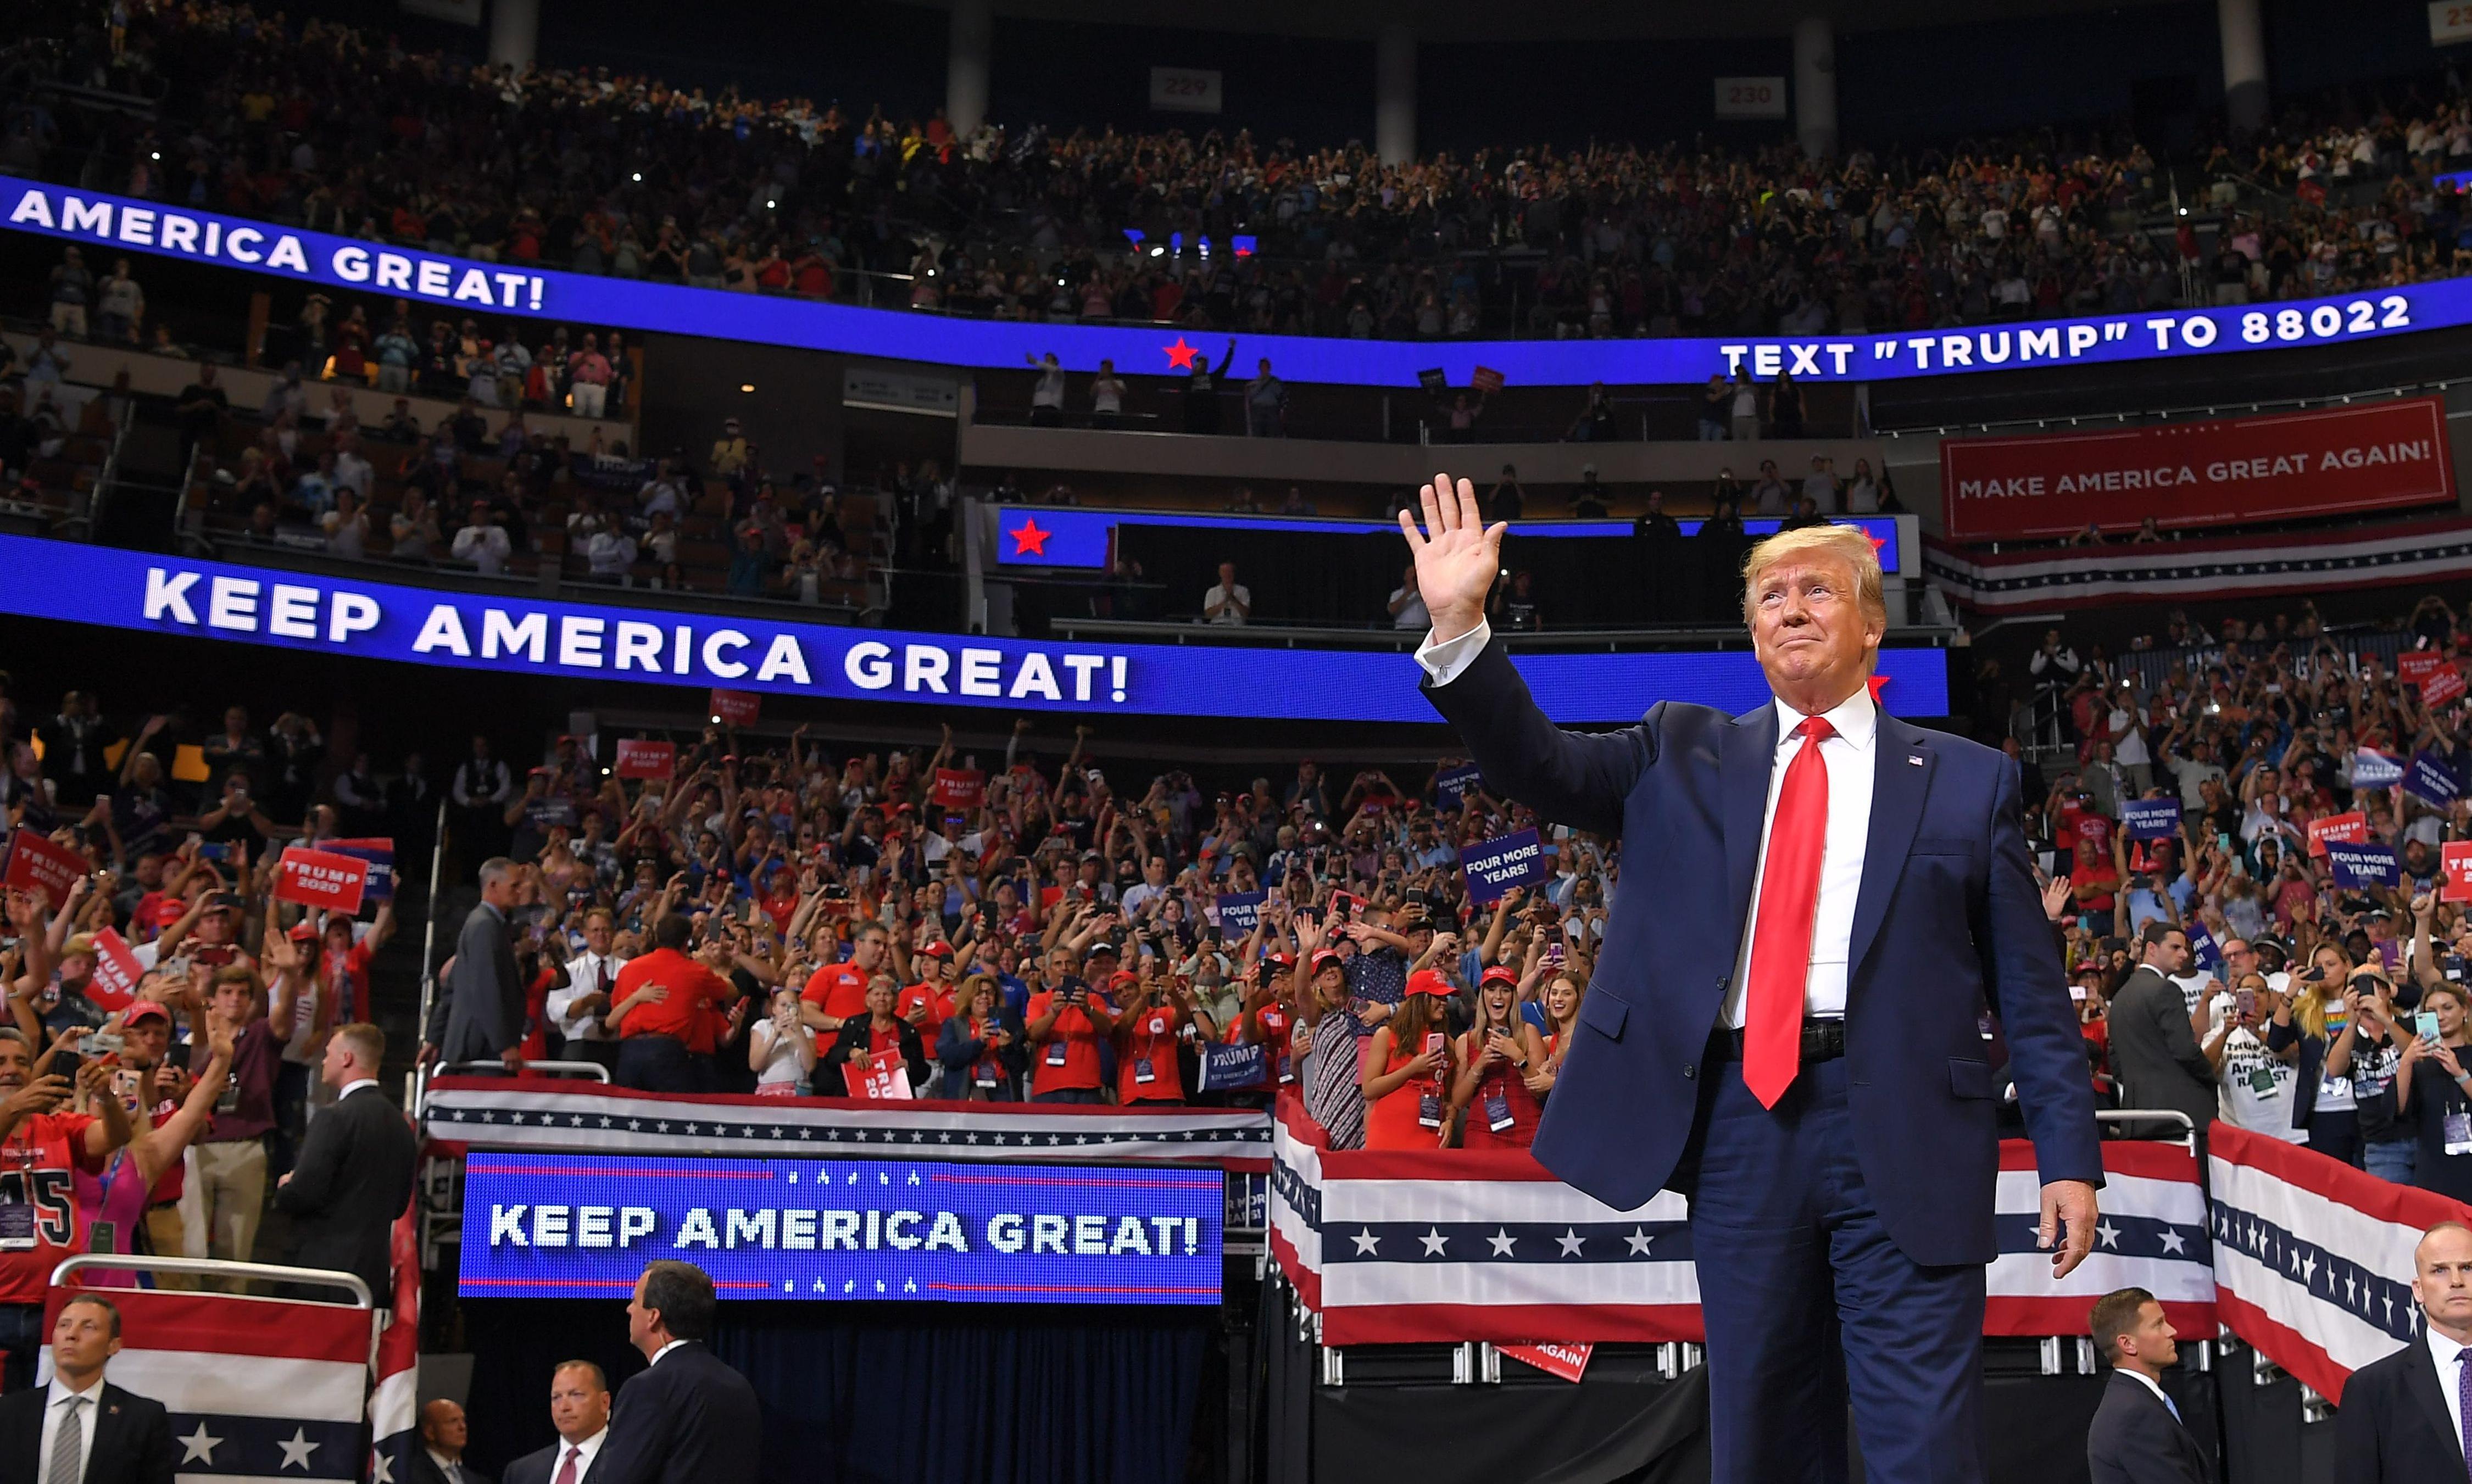 Trump's 2020 kick-off proves he lacks the self-awareness to change